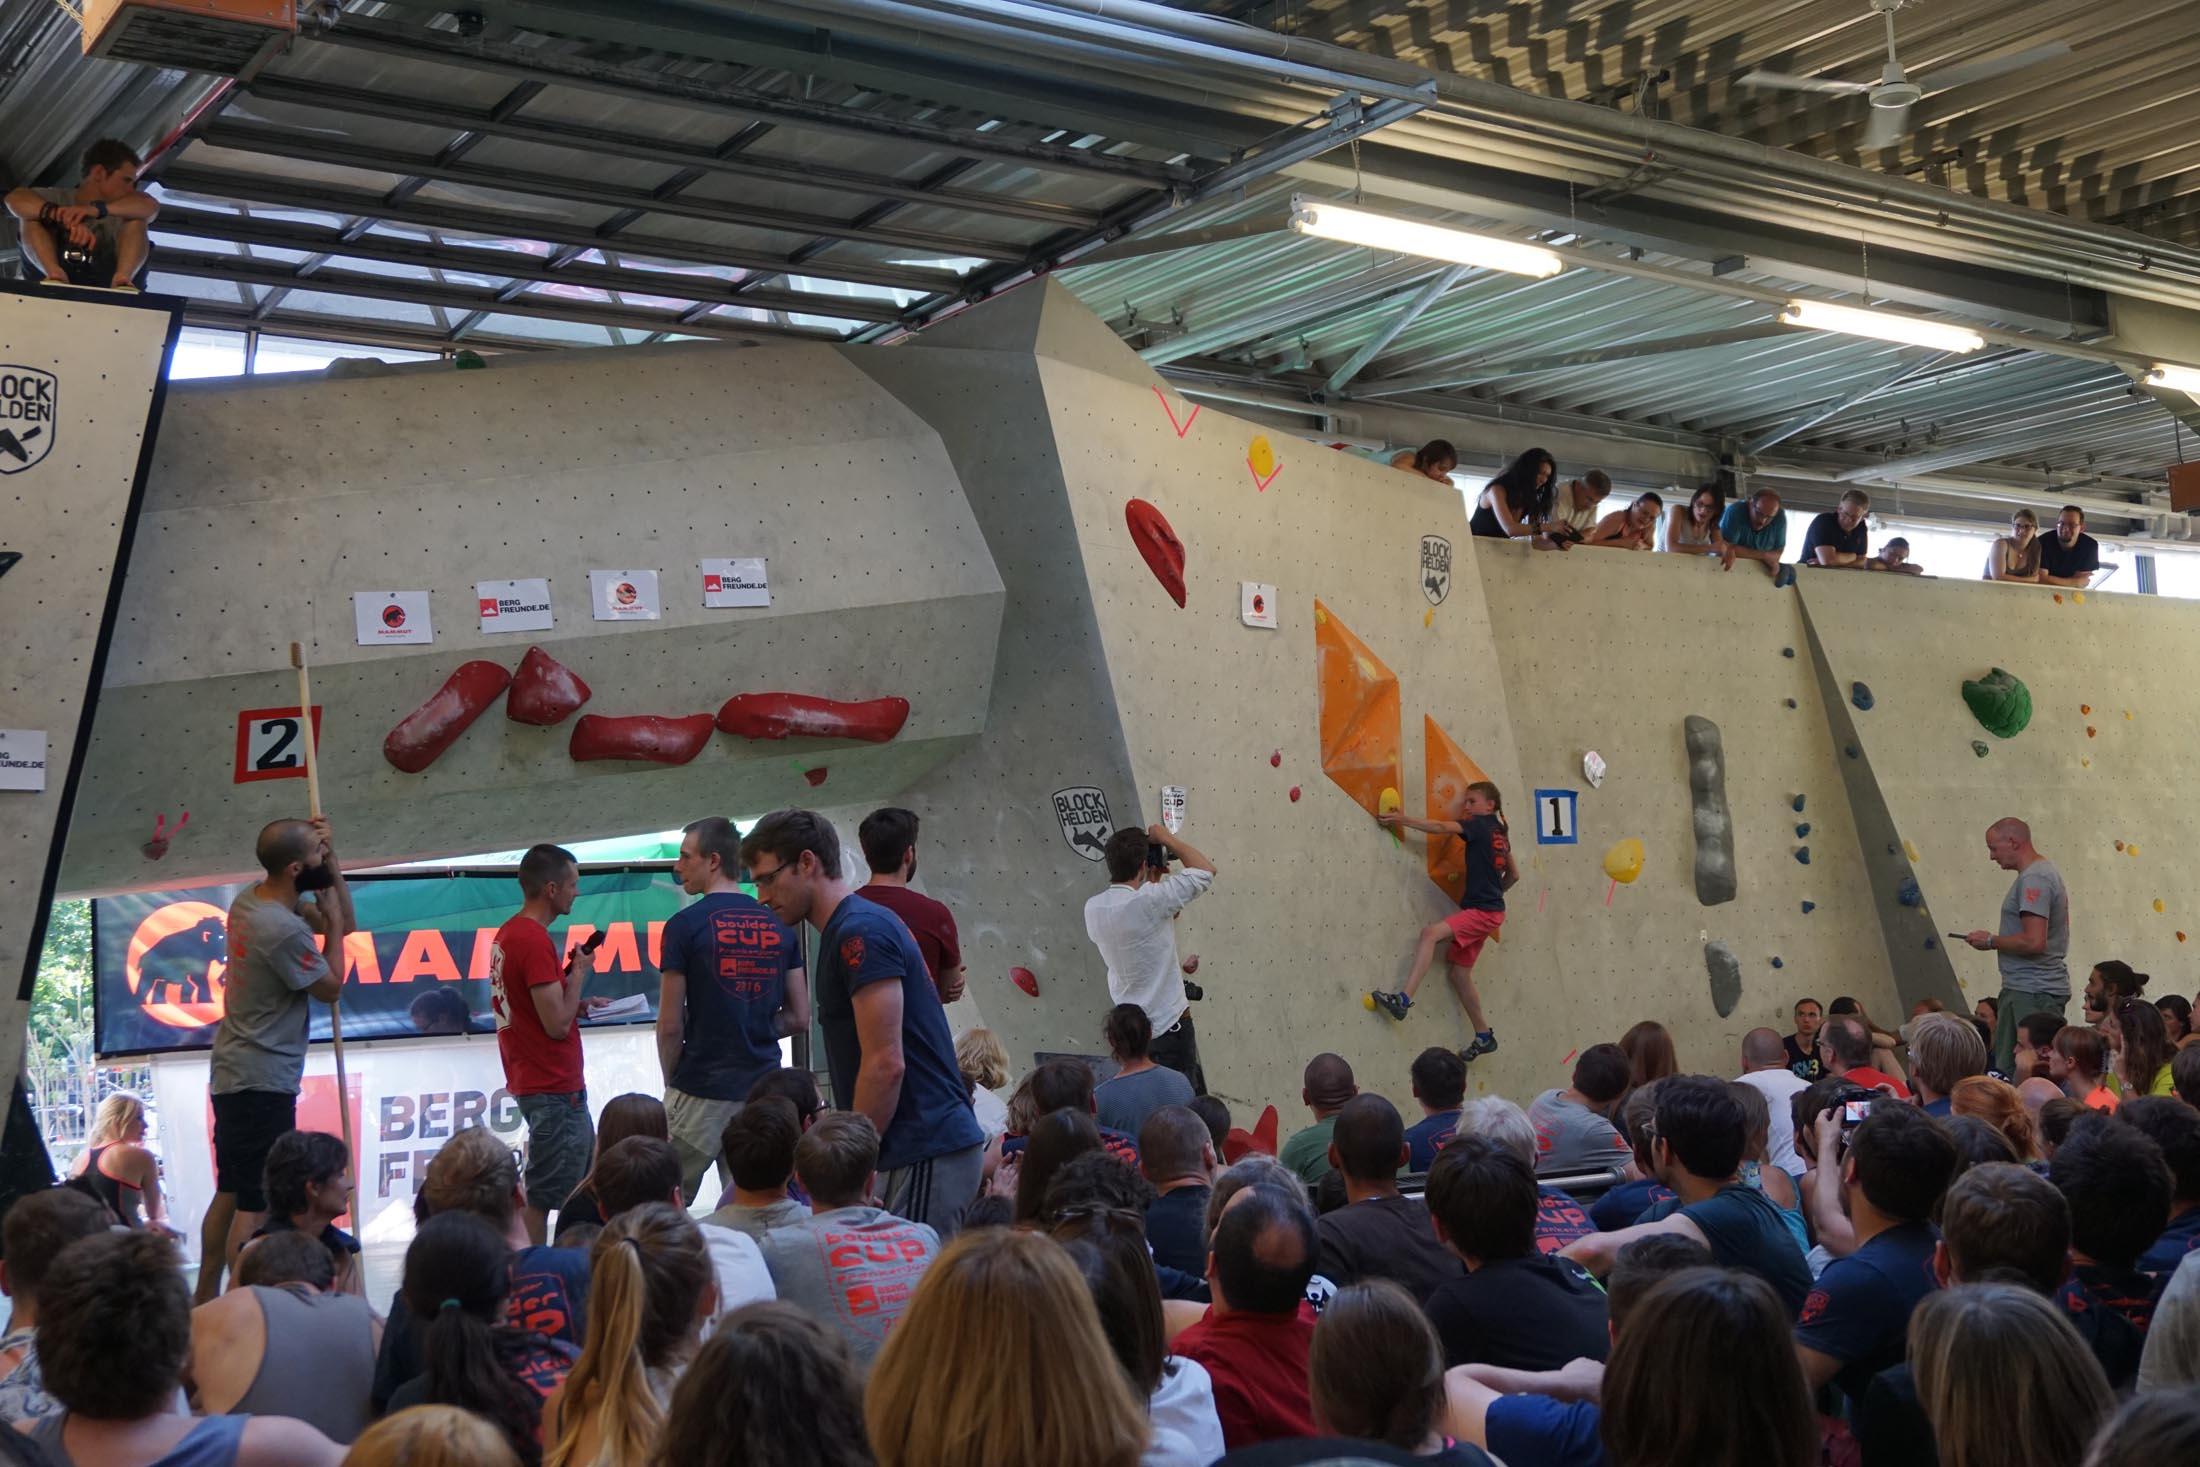 Finale, internationaler bouldercup Frankenjura 2016, BLOCKHELDEN Erlangen, Mammut, Bergfreunde.de, Boulderwettkampf07092016575